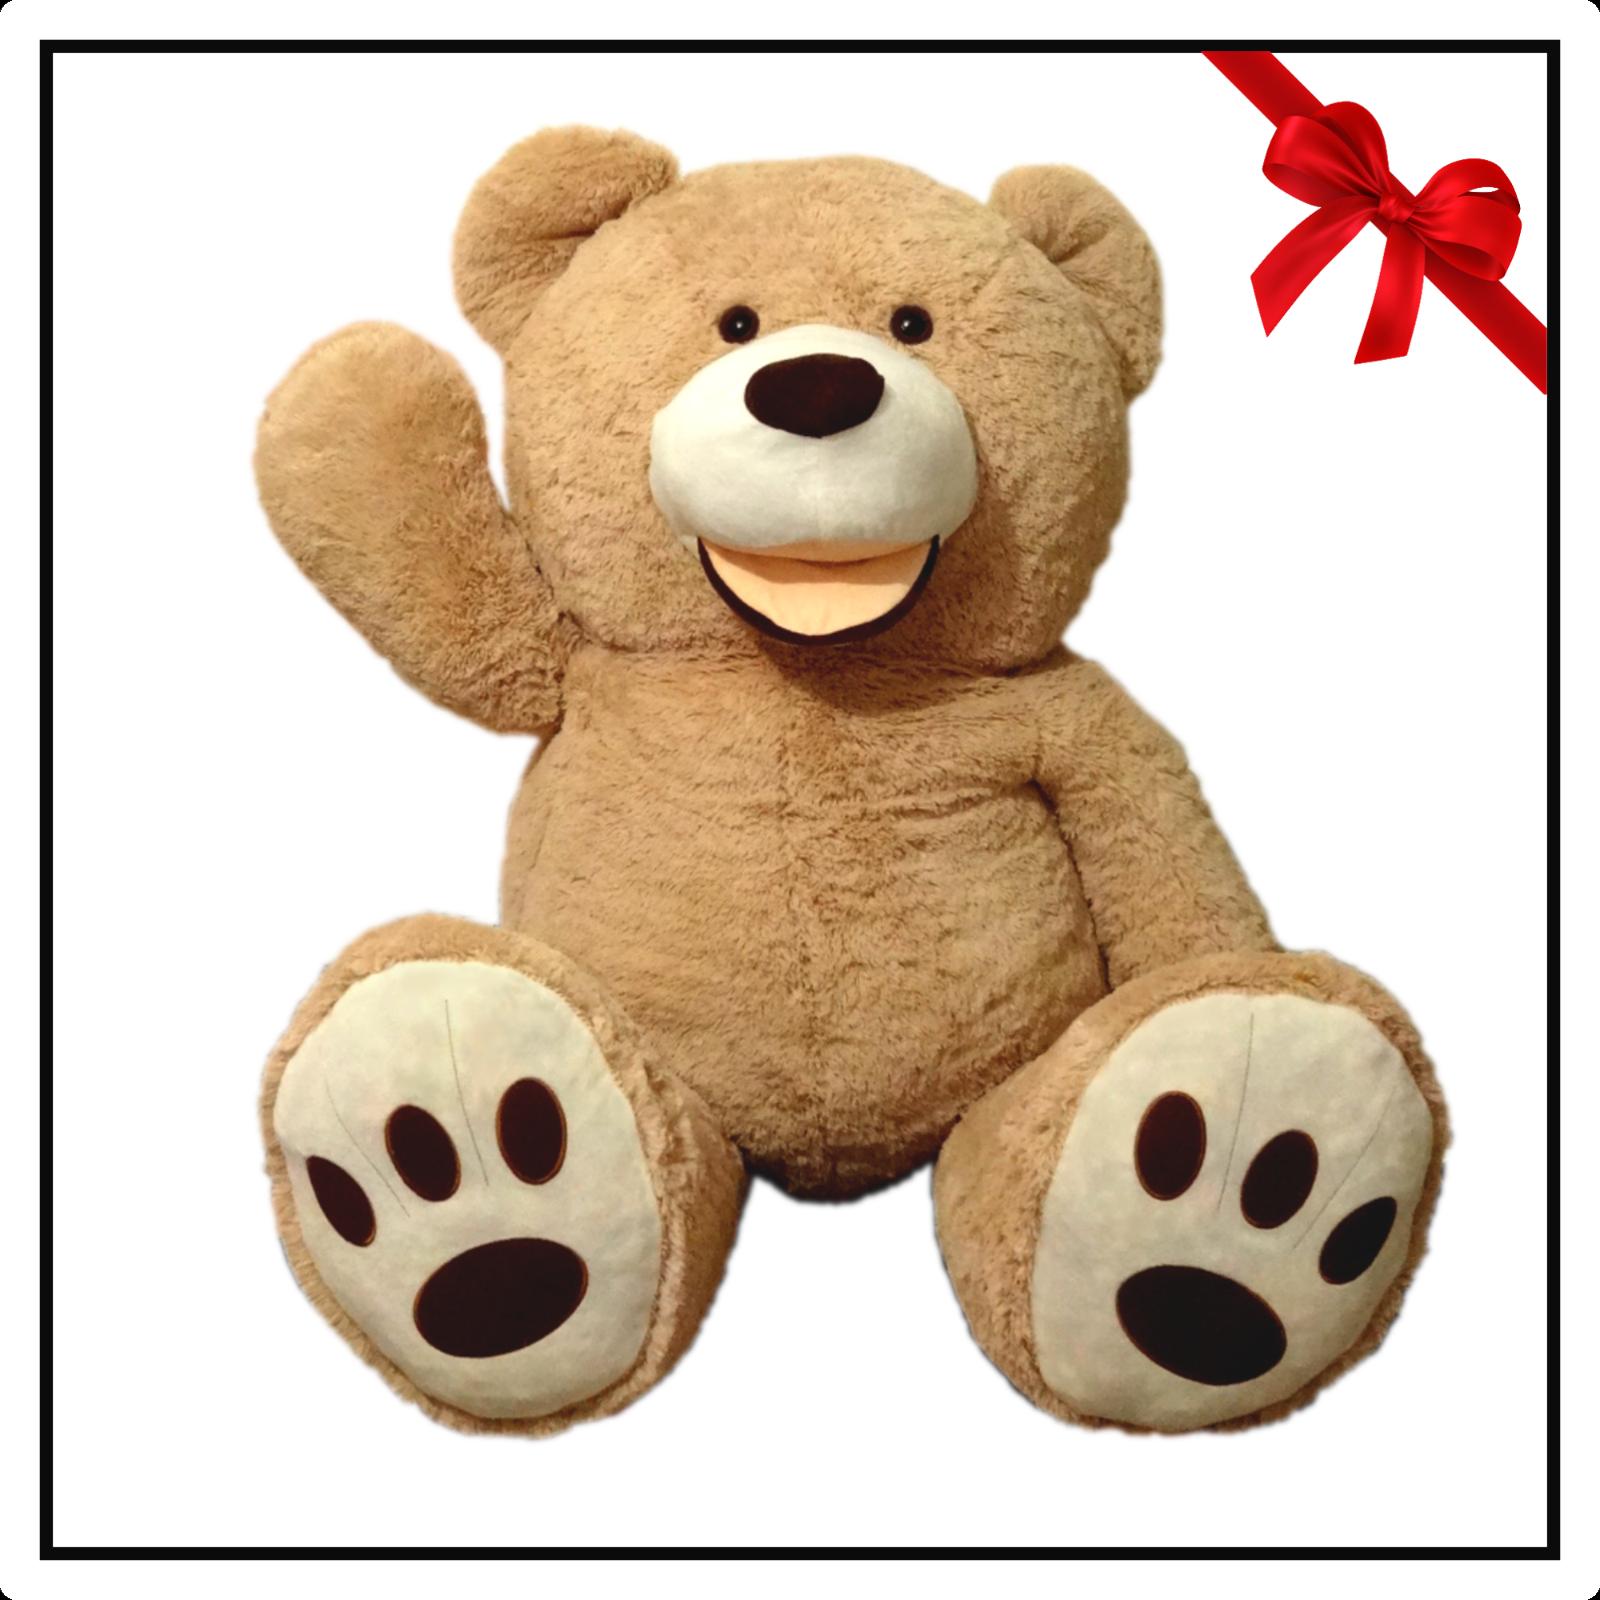 Peluche Orso Gigante 3 metri  Teddy Bear Orsetto Grande XXL Regalo San Valentino